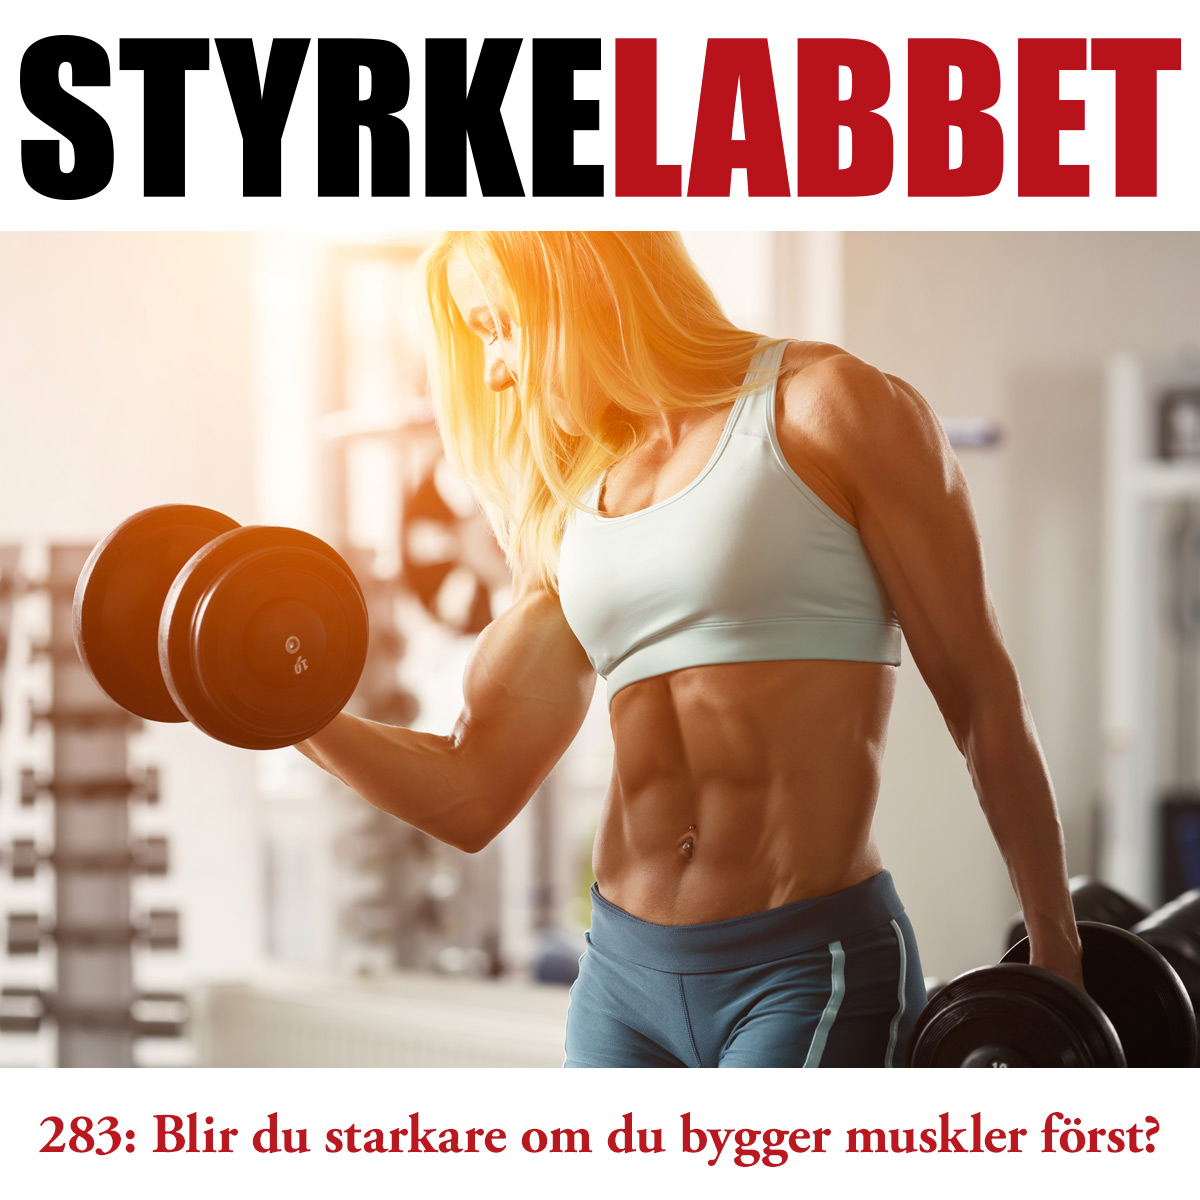 Styrkelabbet avsnitt 283: Blir du starkare om du bygger muskler först?